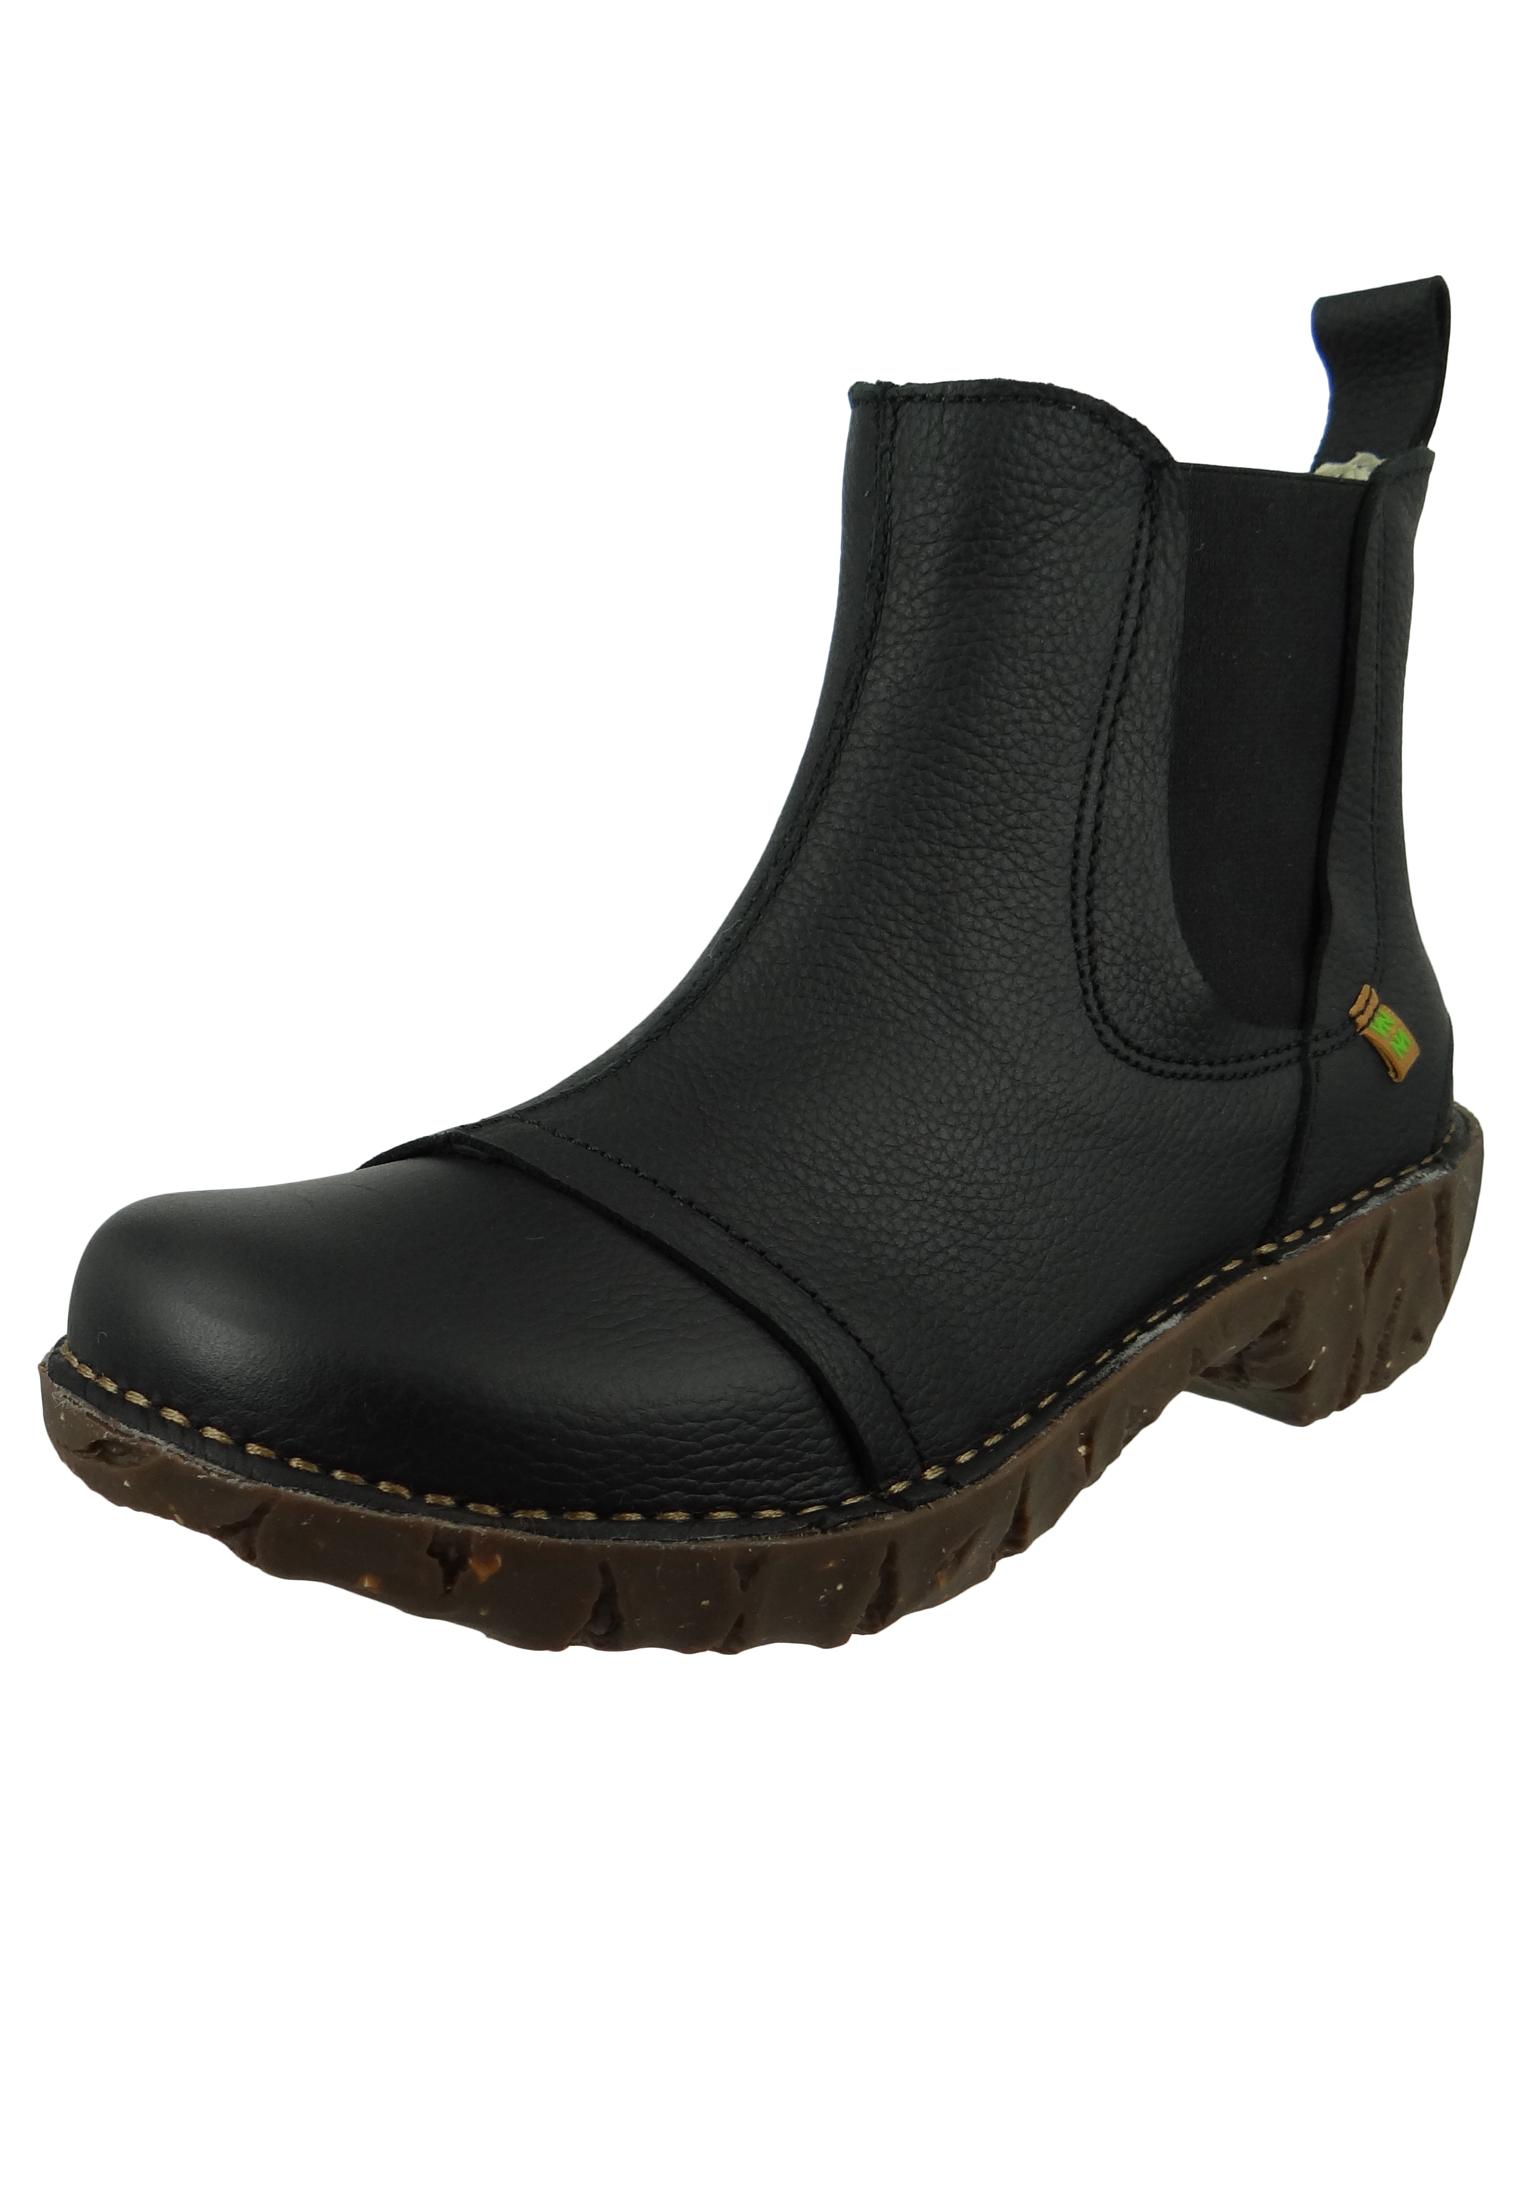 7d456061817193 El Naturalista Schuhe Damen Stiefelette N158 YGGDRASIL Black Schwarz ...